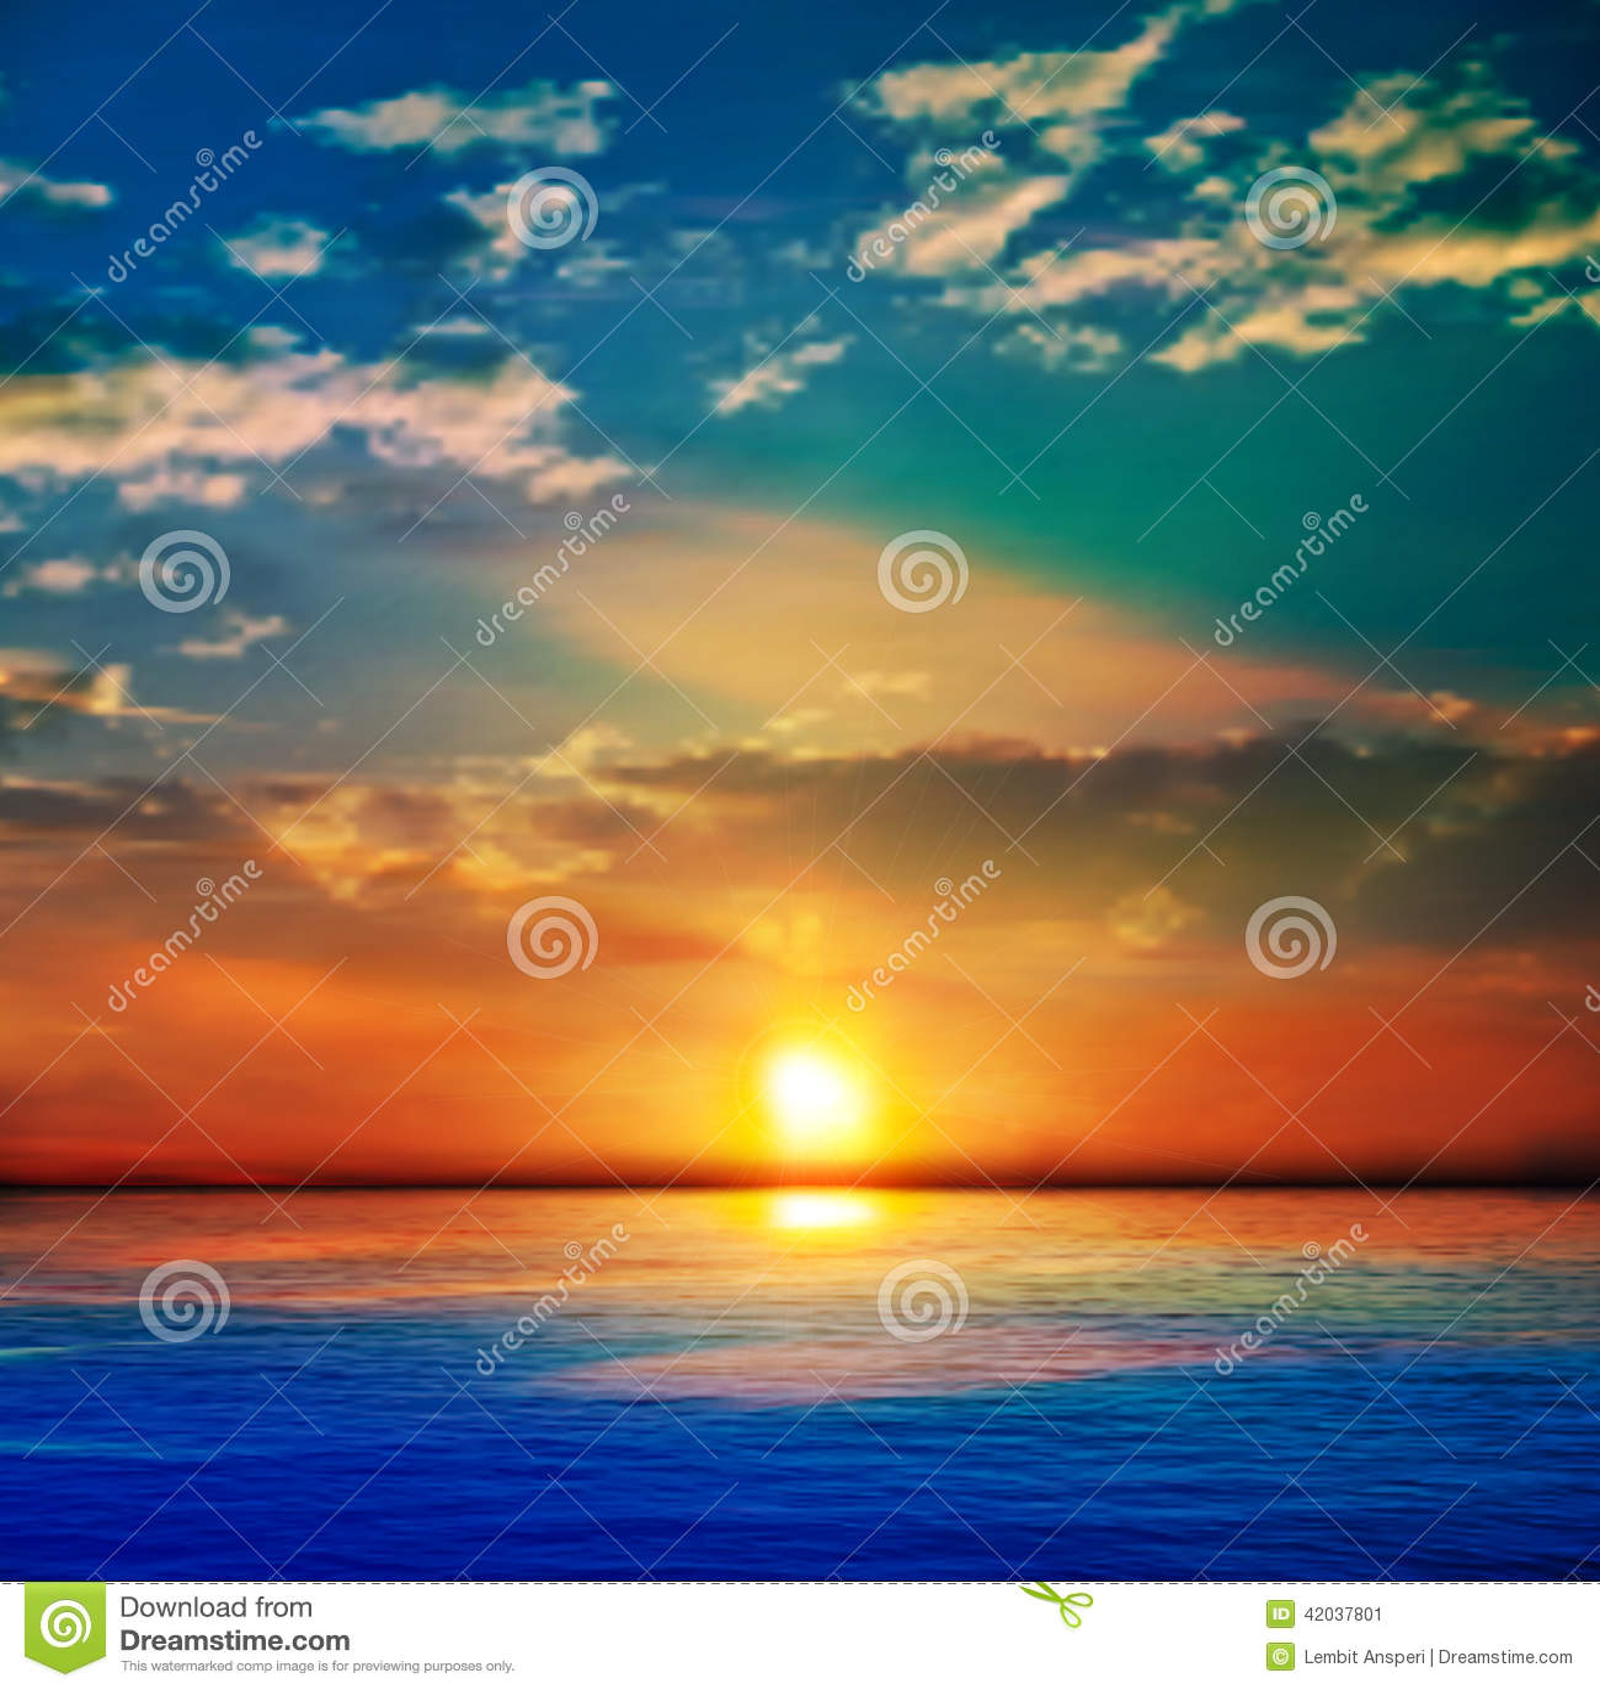 Fundo azul abstrato da natureza com o mar unset e as nuvens